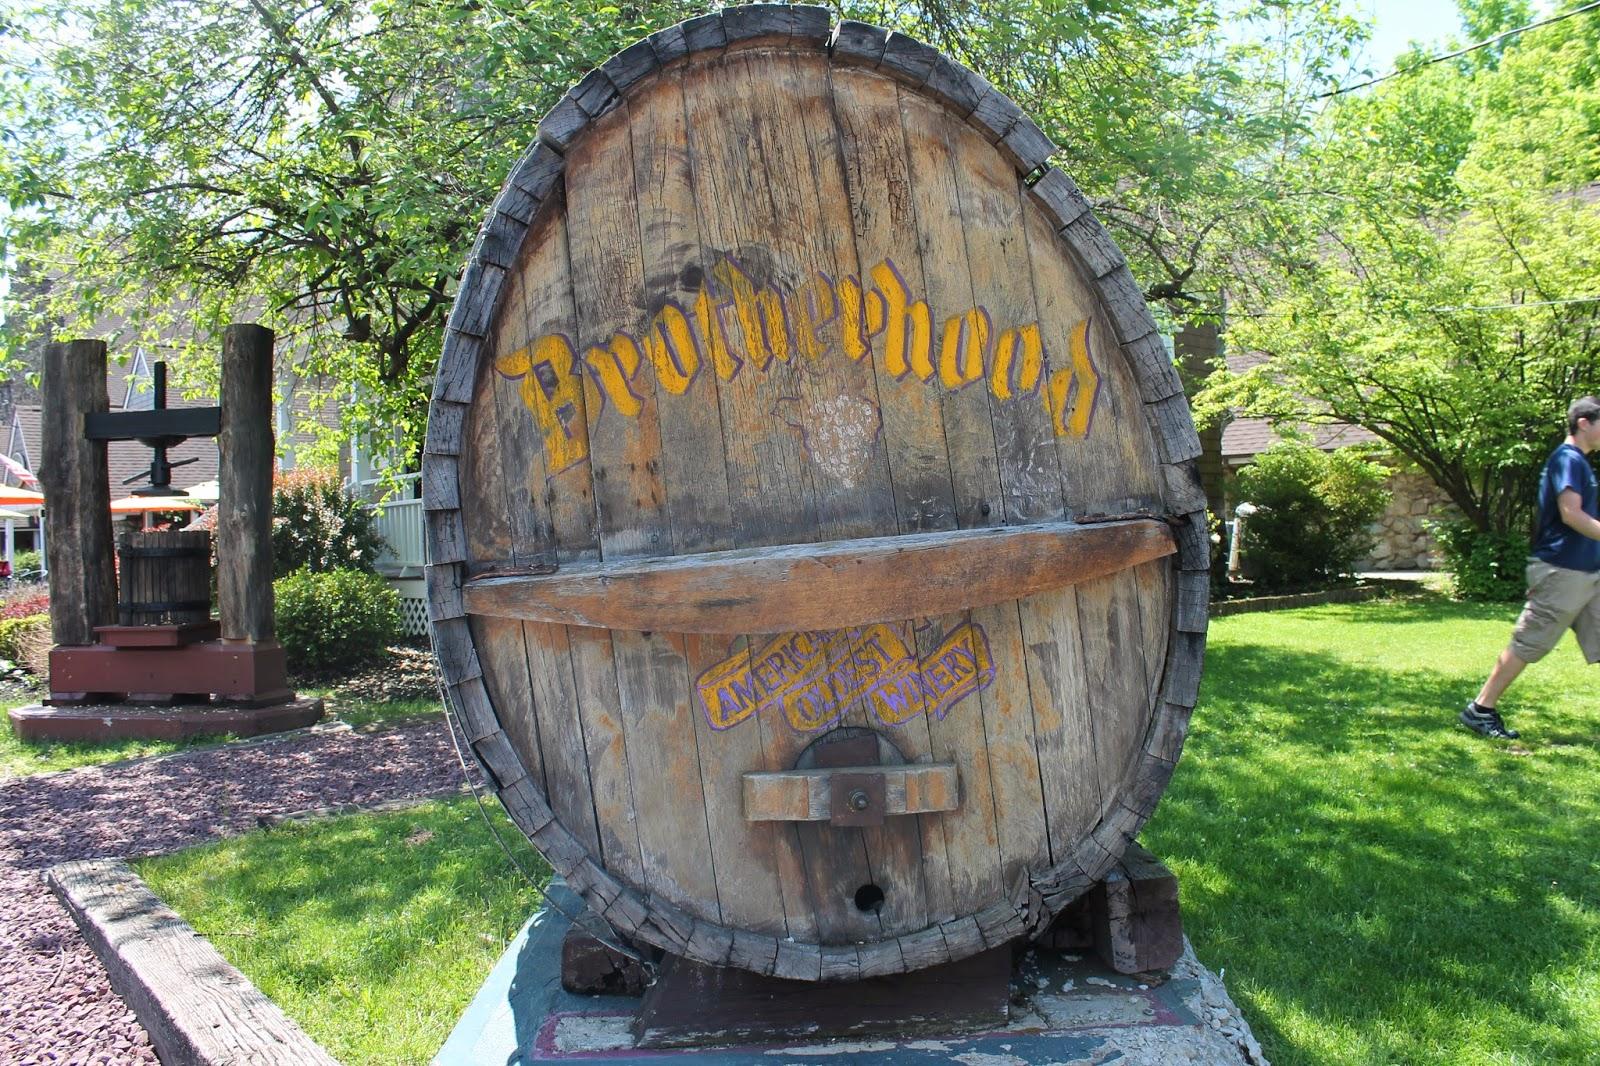 Brotherhood Winery wine barrel sign